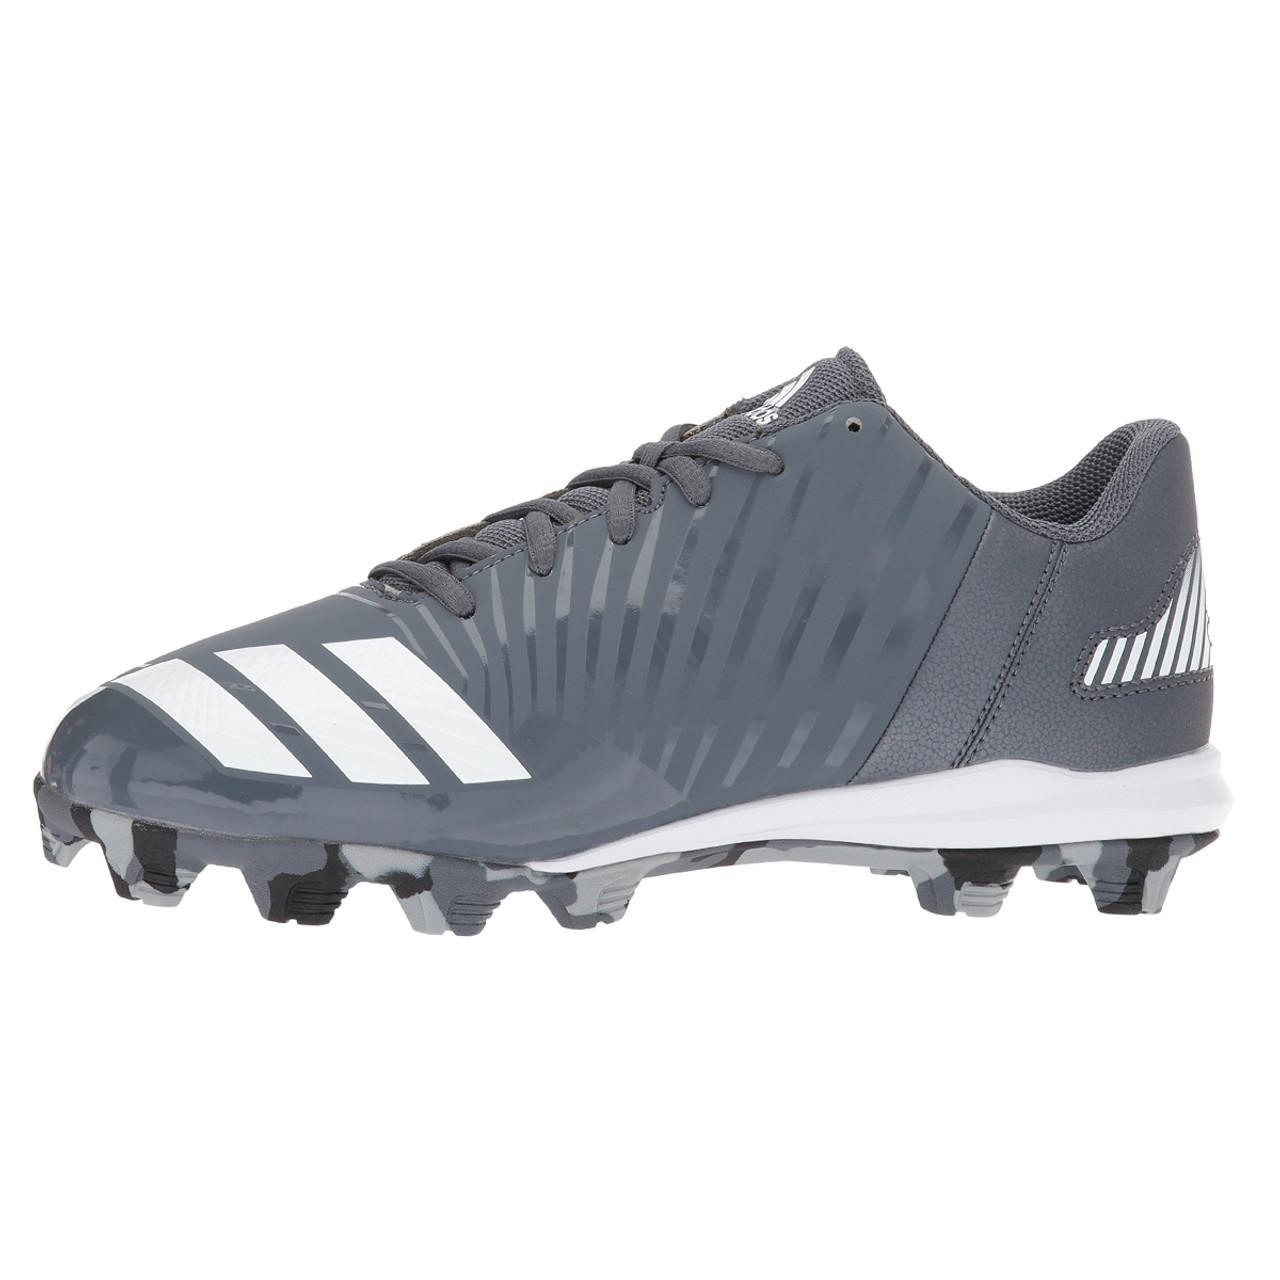 Adidas Icon MD Youth Baseball Cleats B39228 - Onyx 4db4e4e87e0